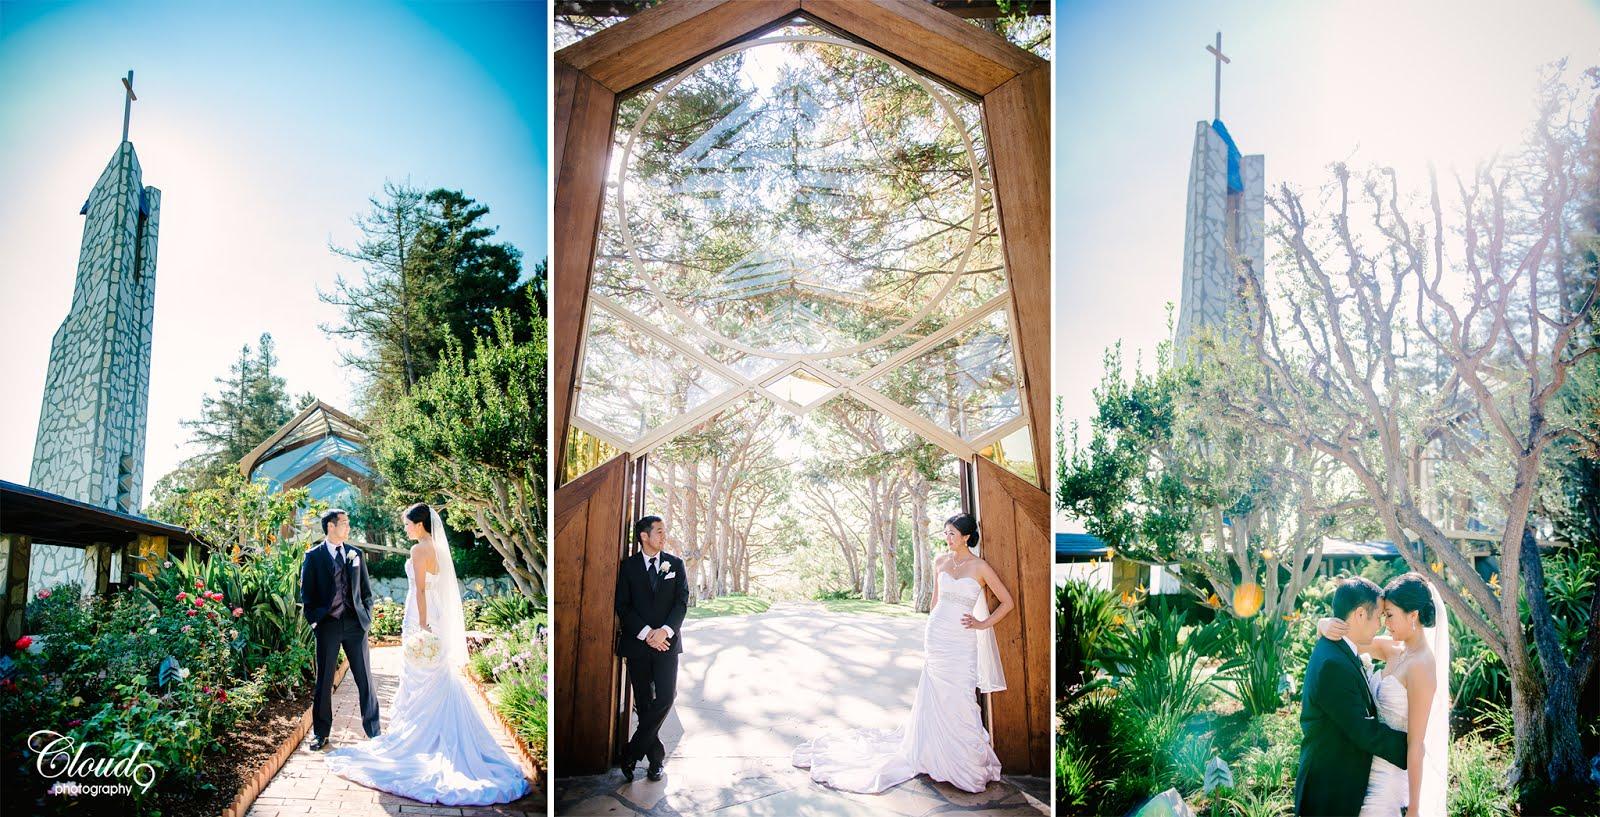 Wayfarers Chapel Wedding.Whitney Andrew Big Day At Wayfarers Chapel Rancho Palos Verdes